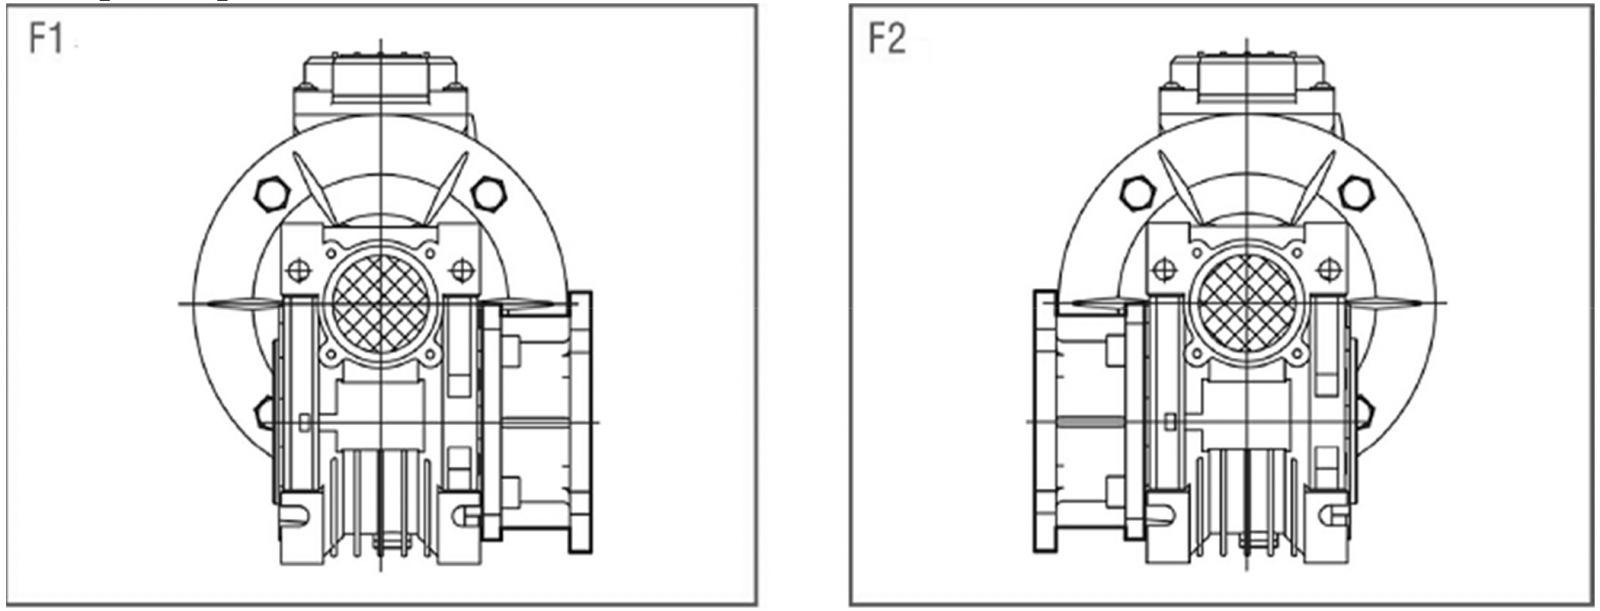 Исполнение опорного фланца редуктора NMRV